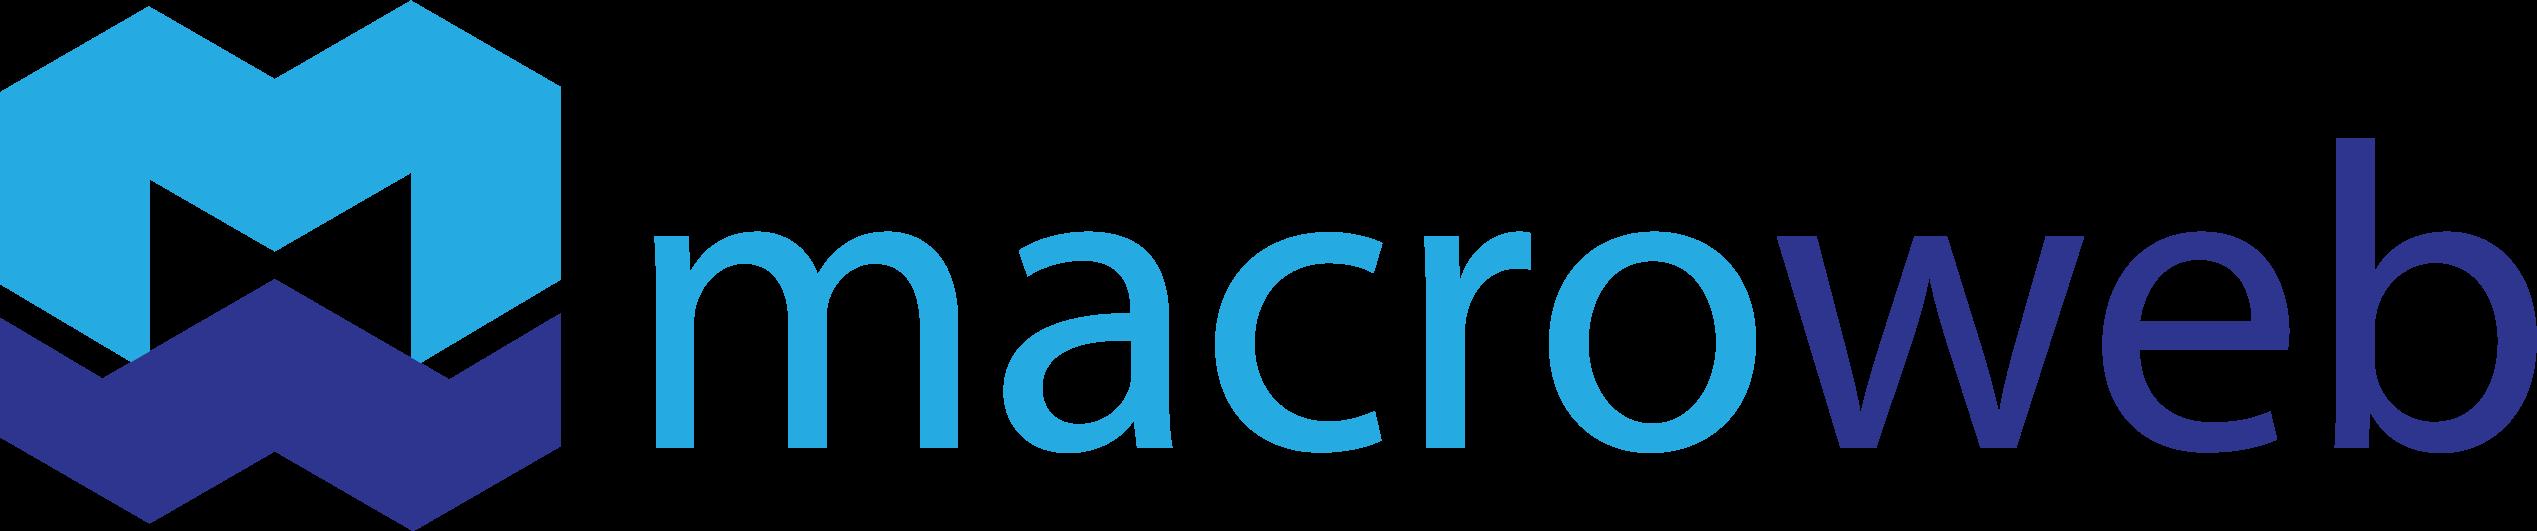 Macroweb